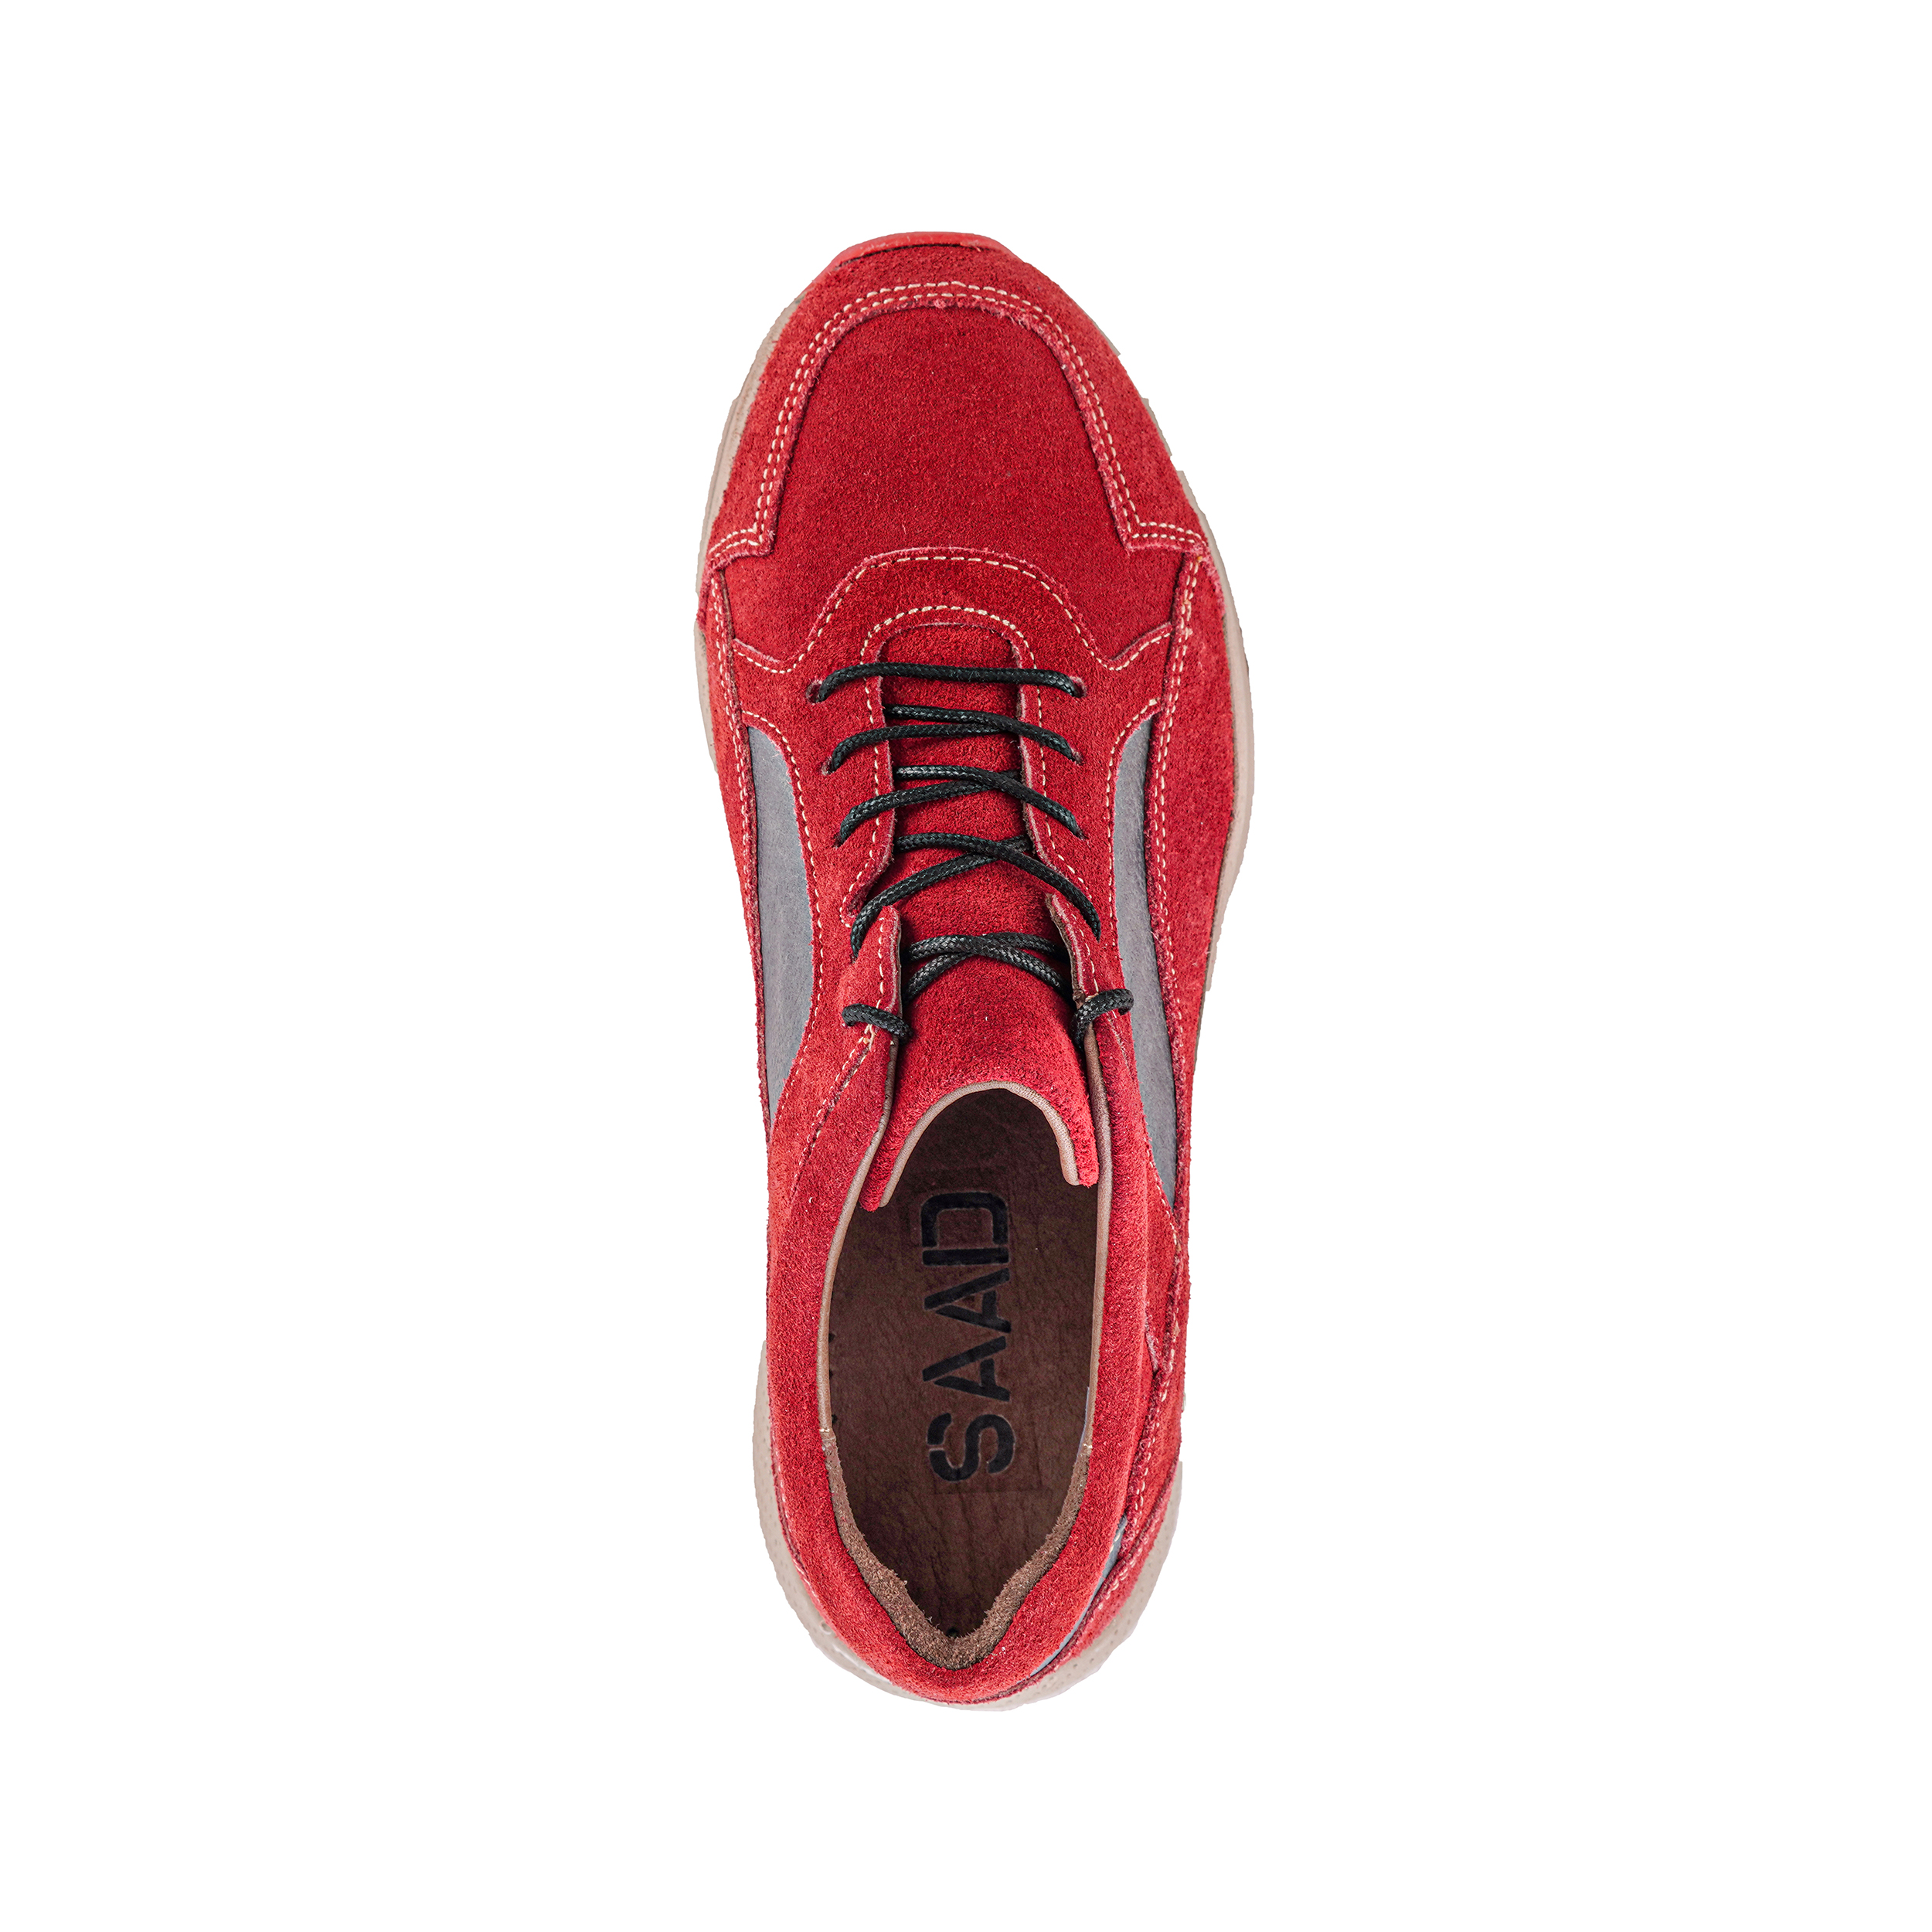 کفش روزمره زنانه صاد کد PP2303